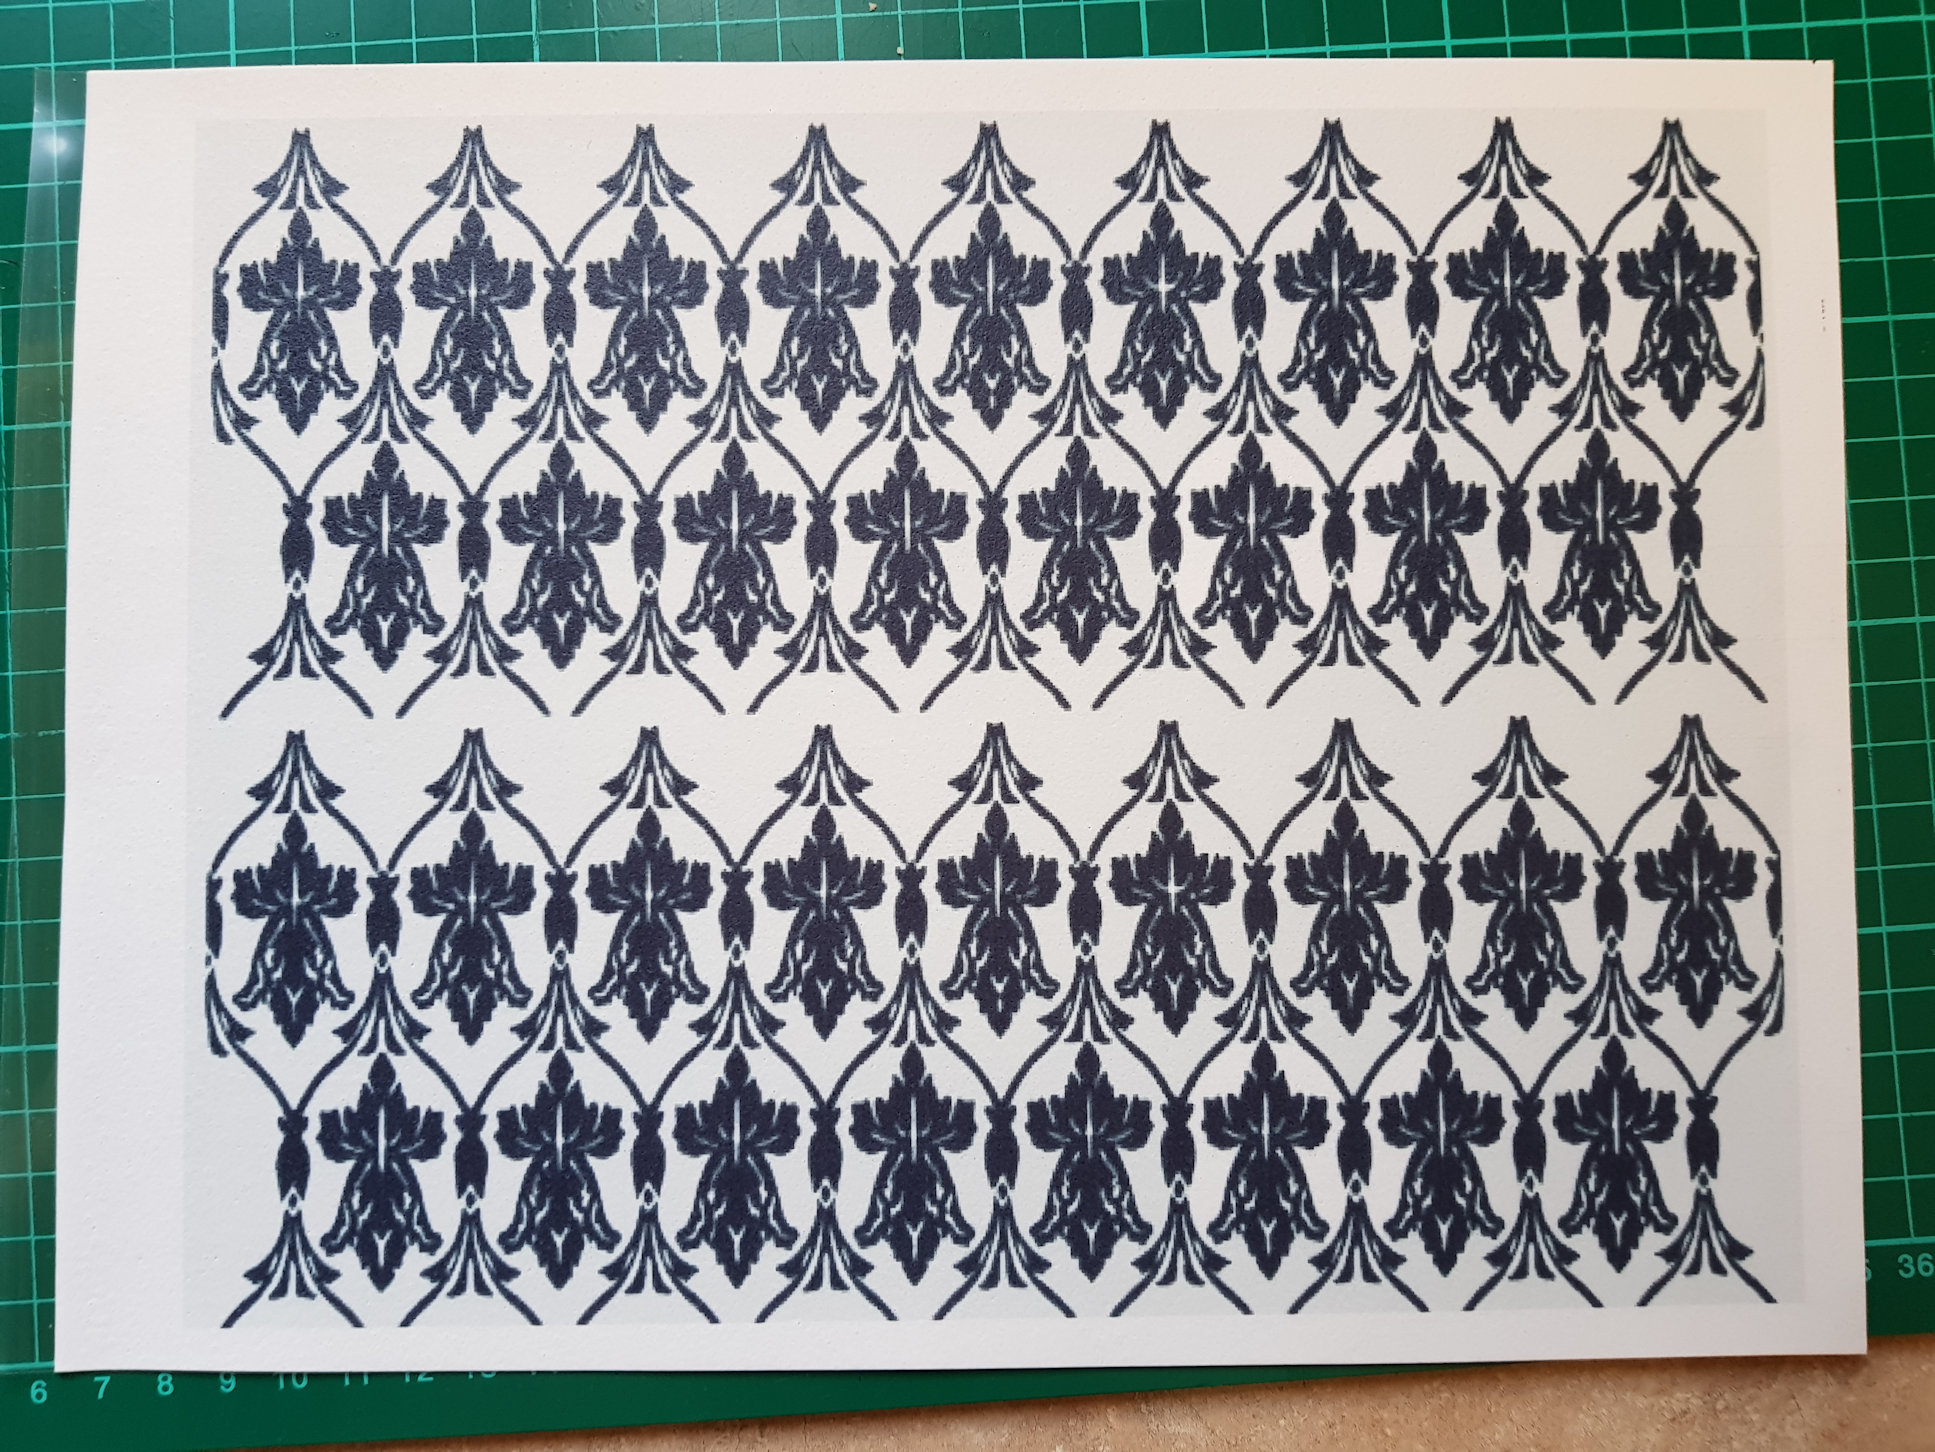 Sherlock Holmes wall paper icing sheet or sugar sheet